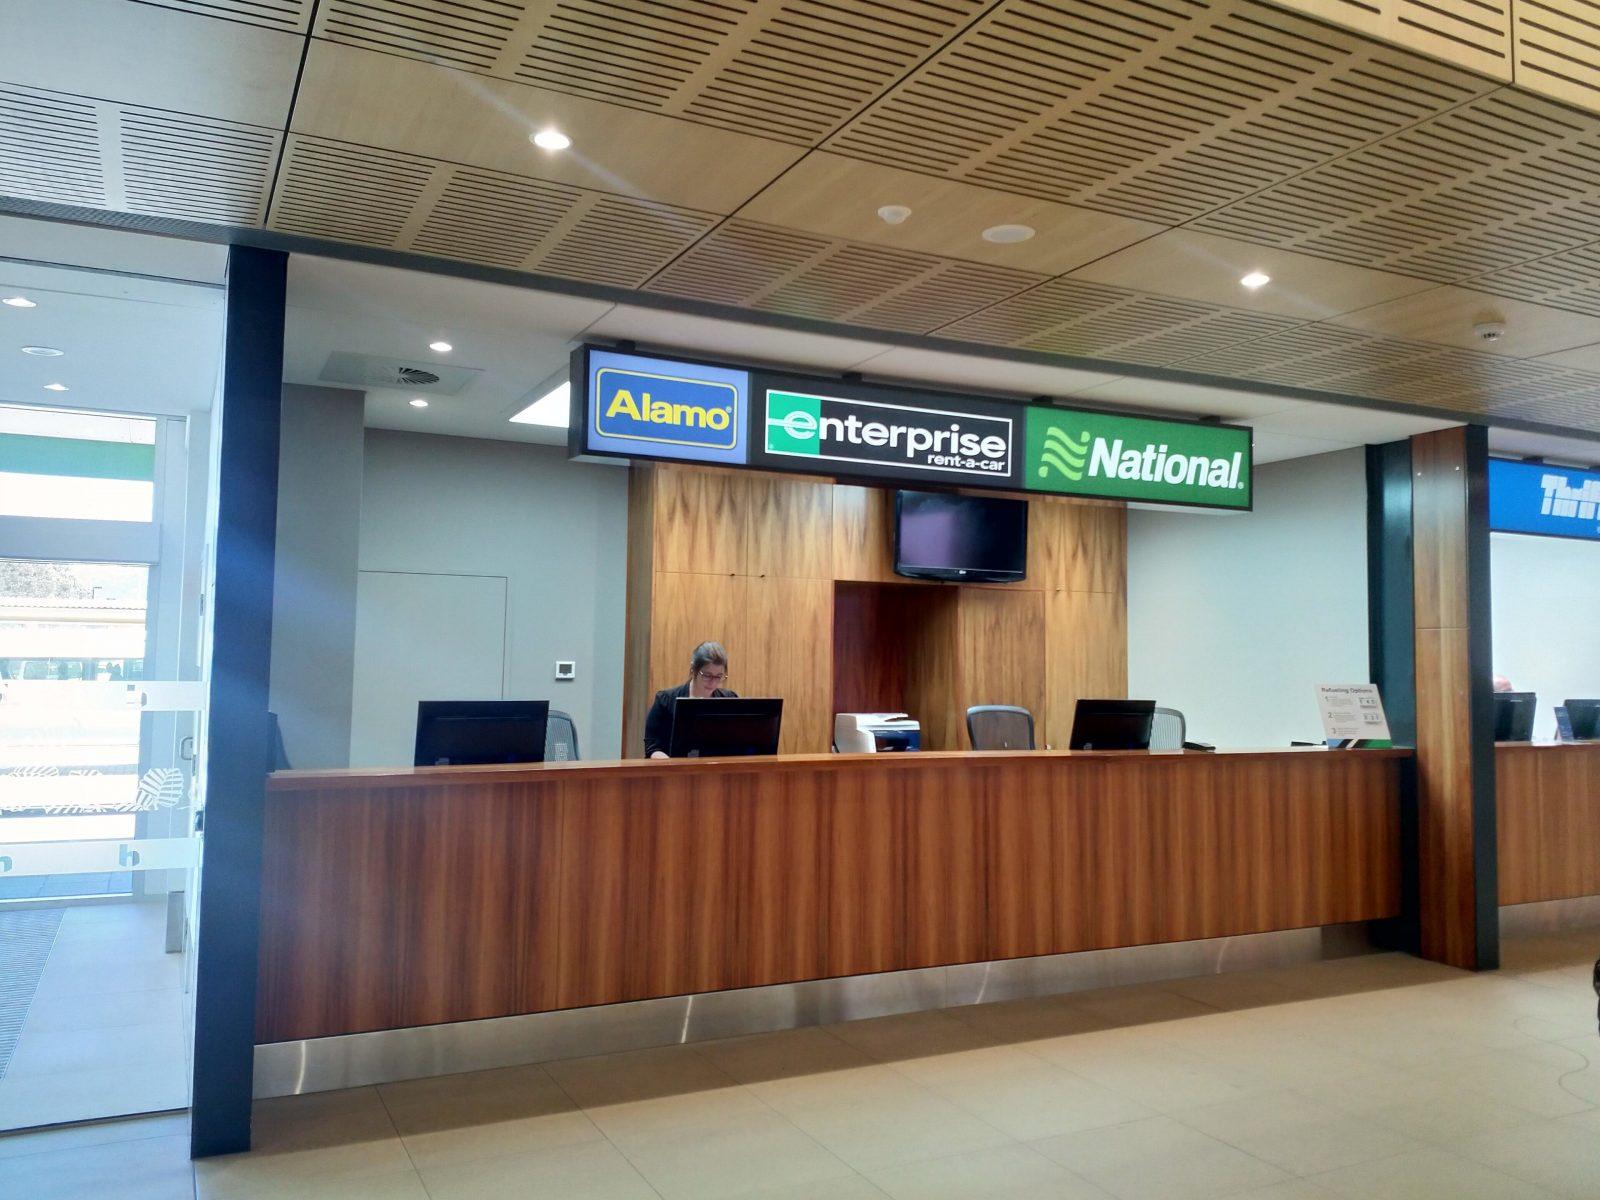 Enterprise Rent a Car Hobart Airport Location Image